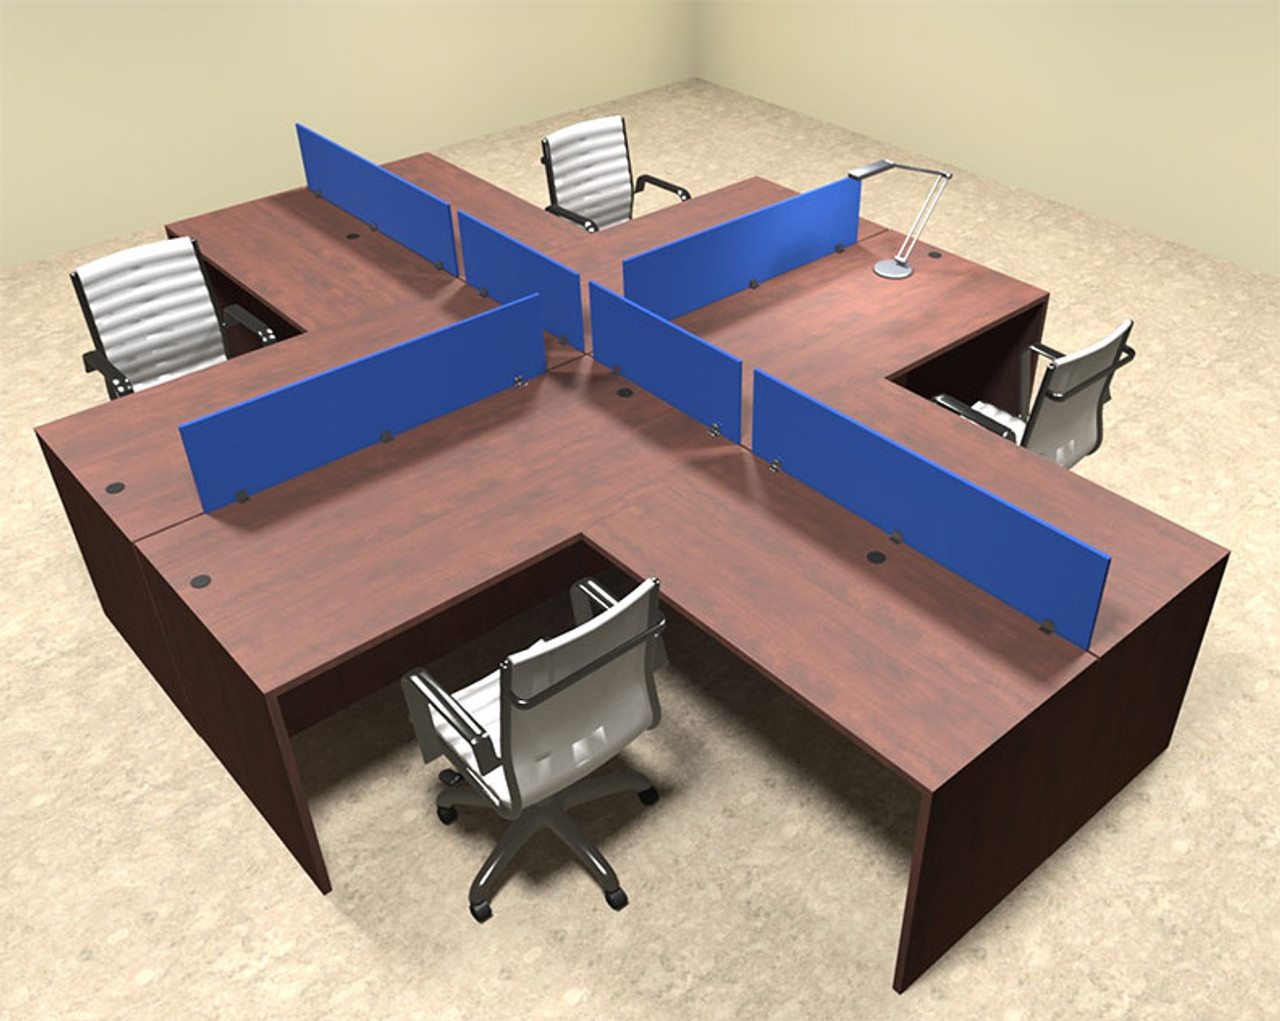 Four Person Blue Divider Office Workstation Desk Set, #OT-SUL-FPB30